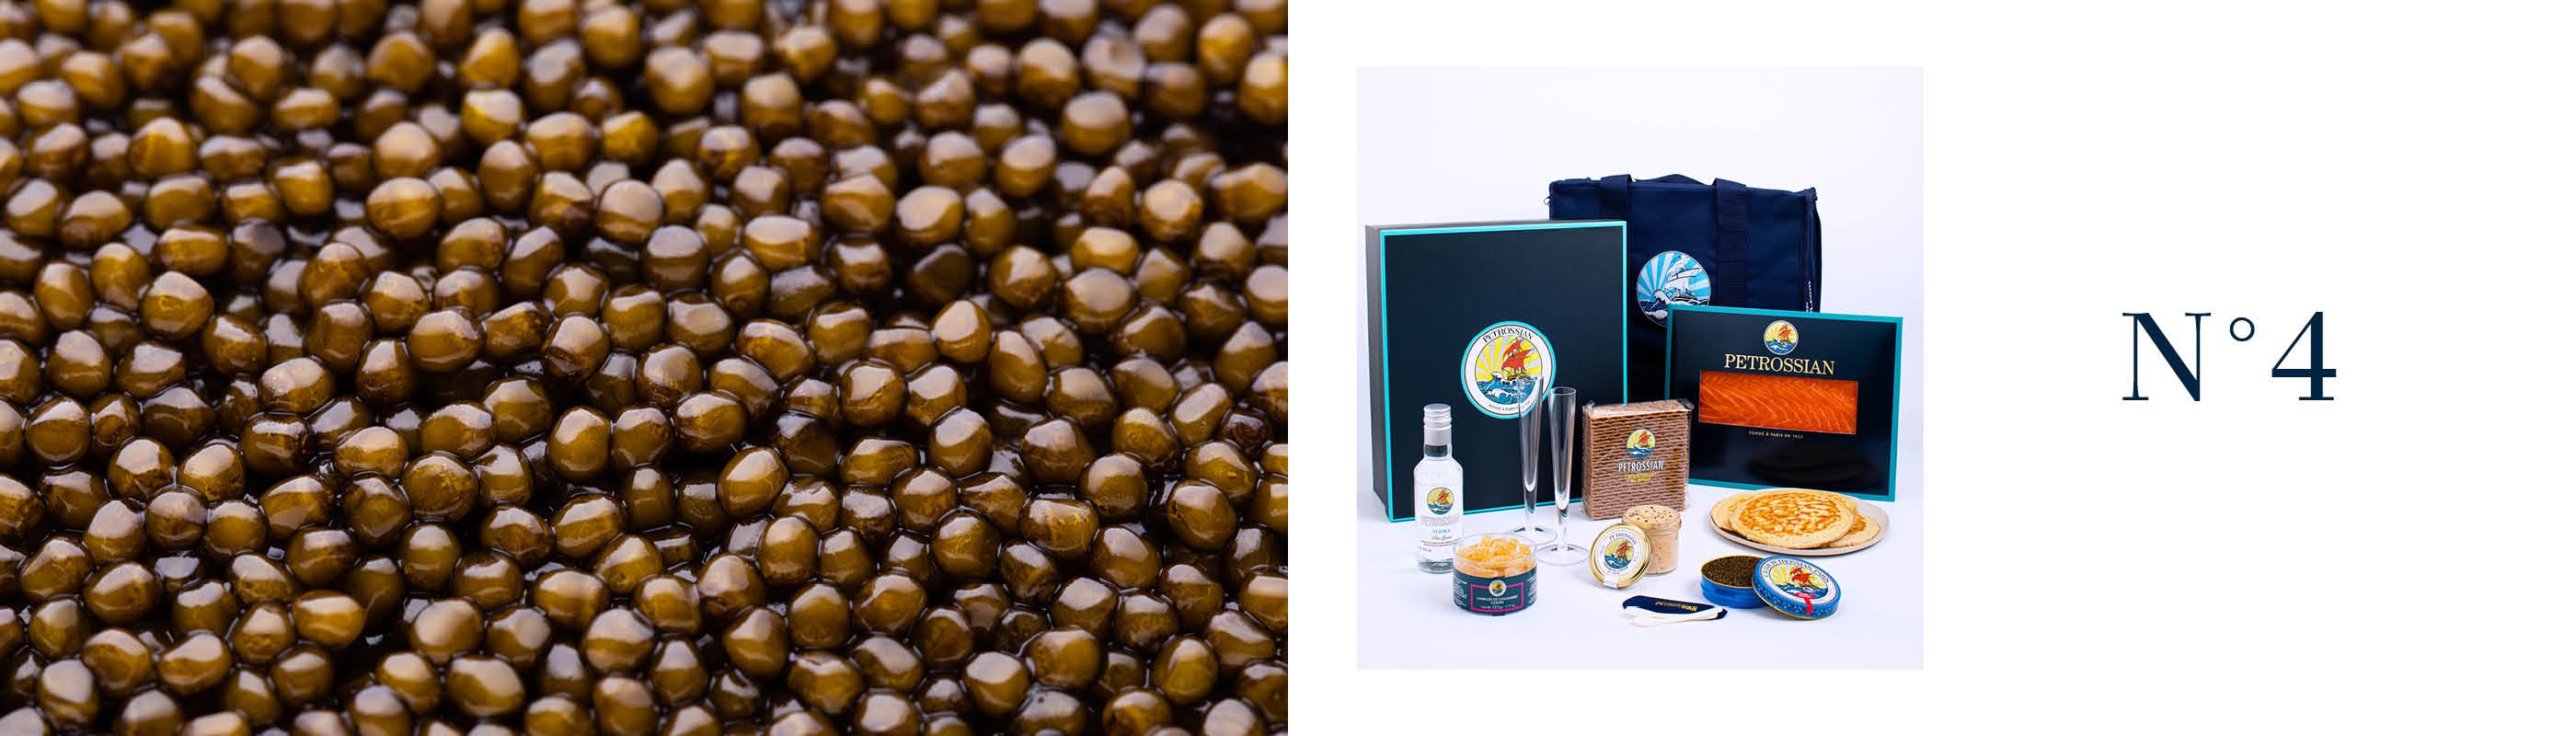 Idée coffret caviar